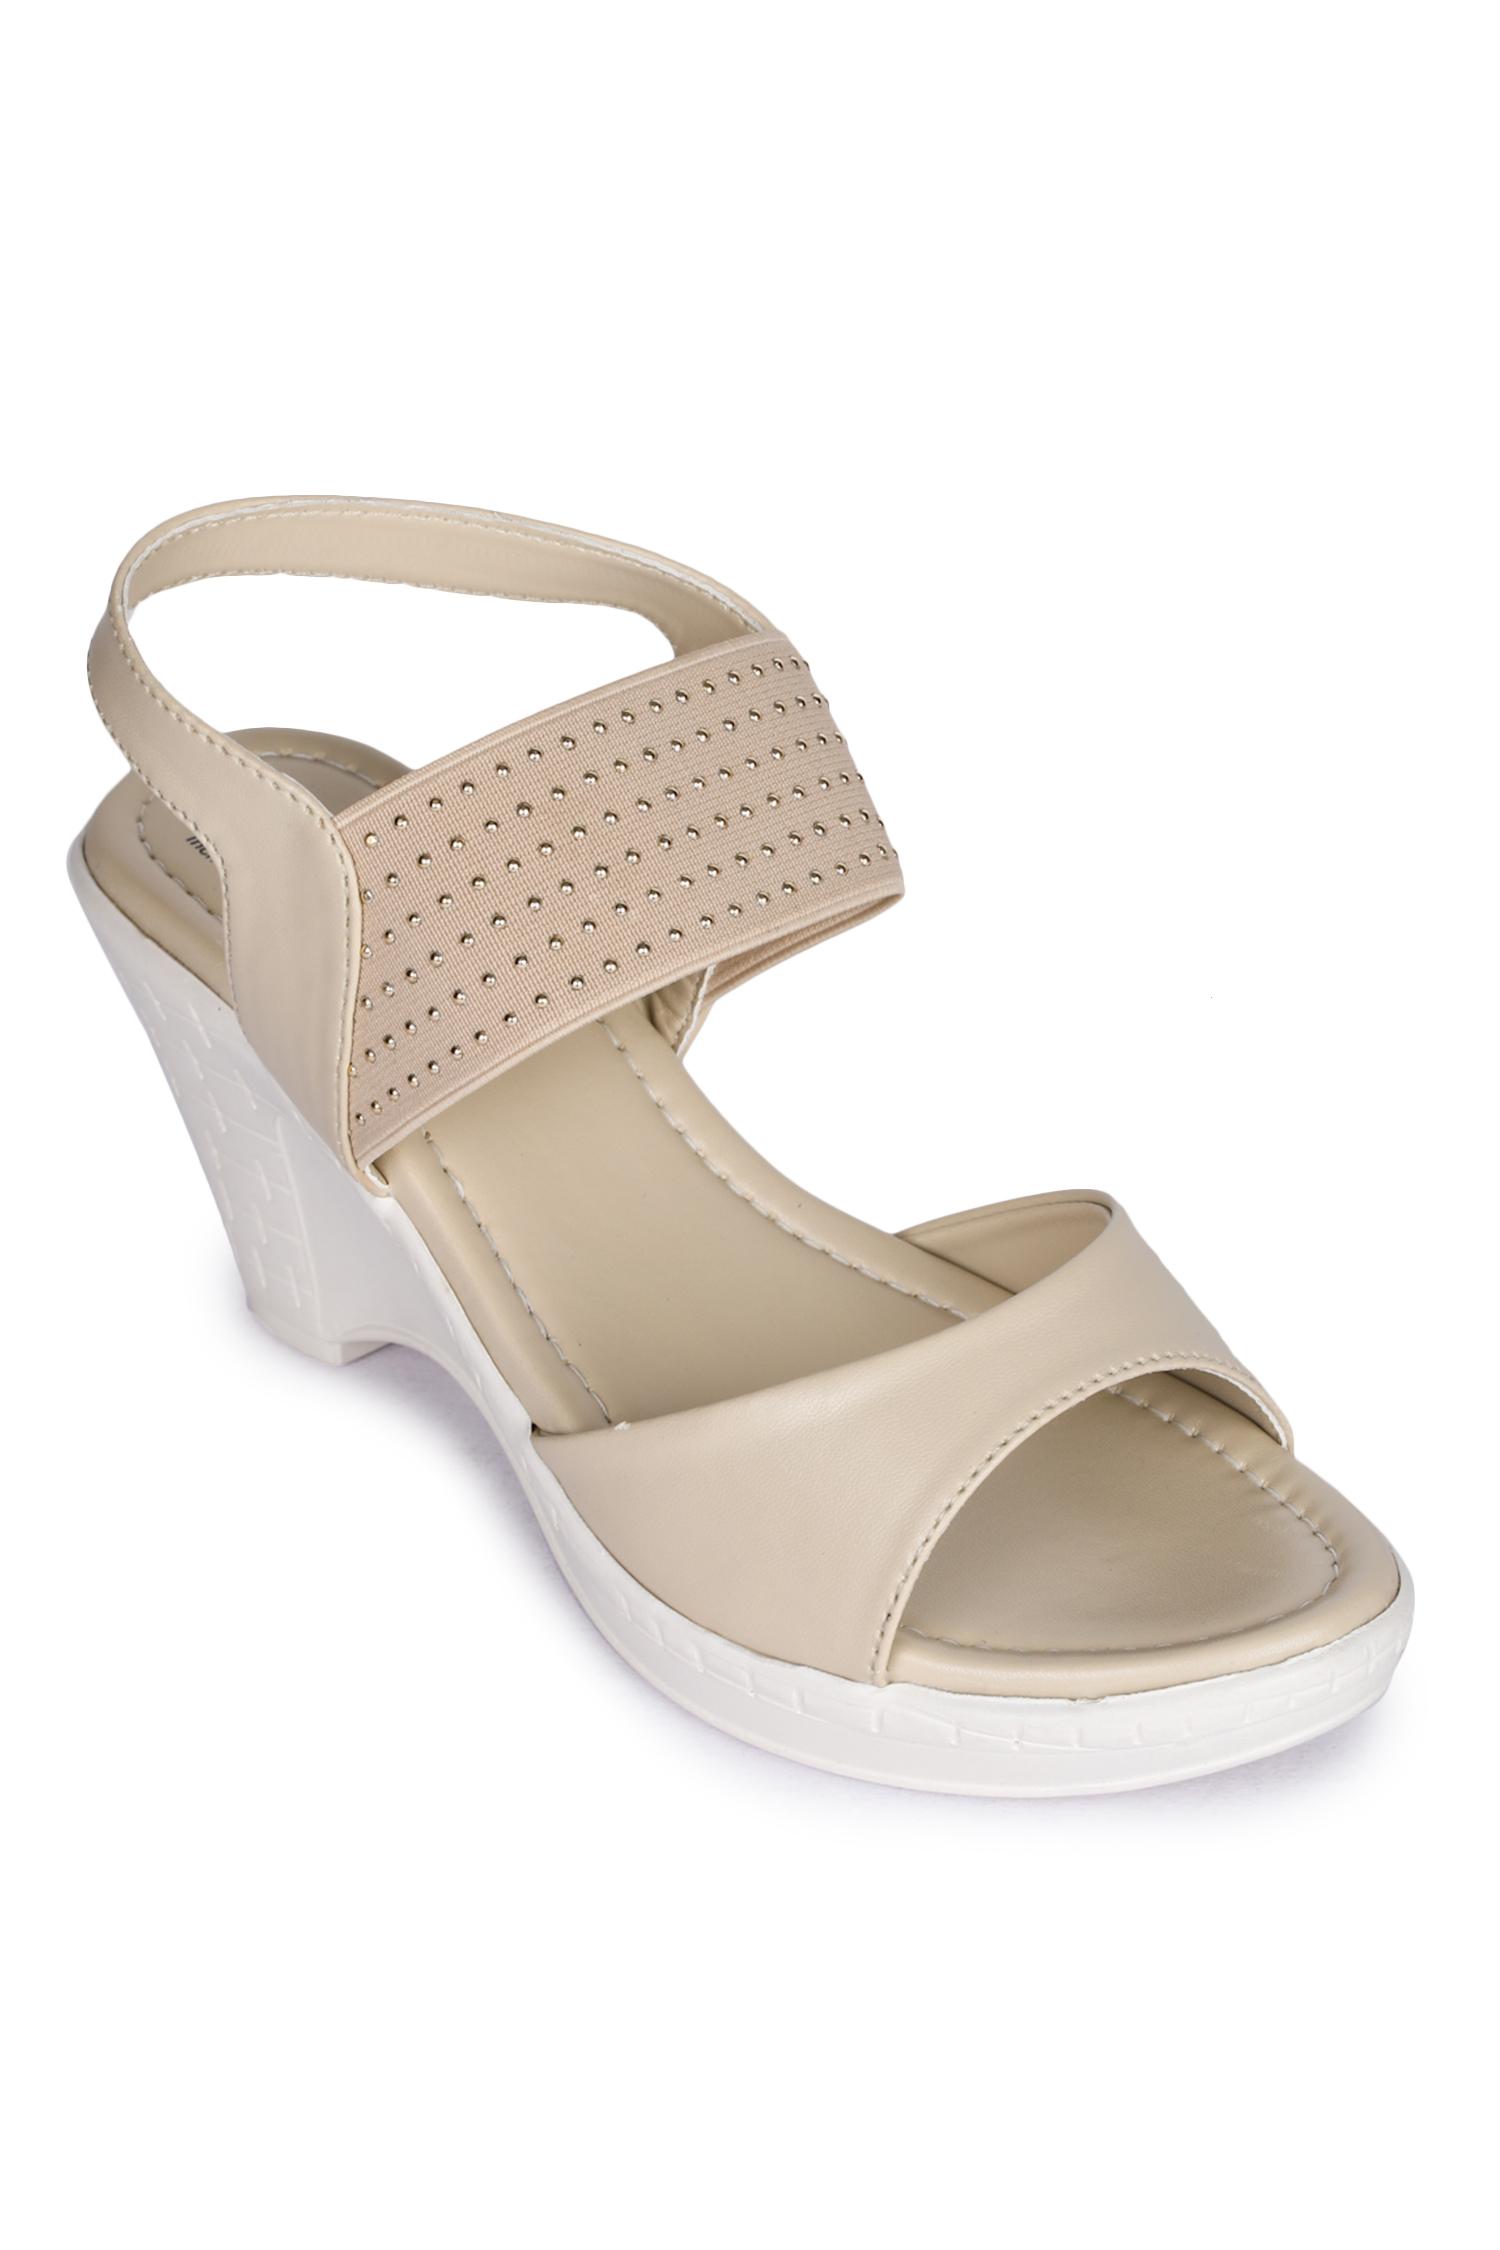 Liberty | Liberty SENORITA Sandals D1-09_CREAM For - Women